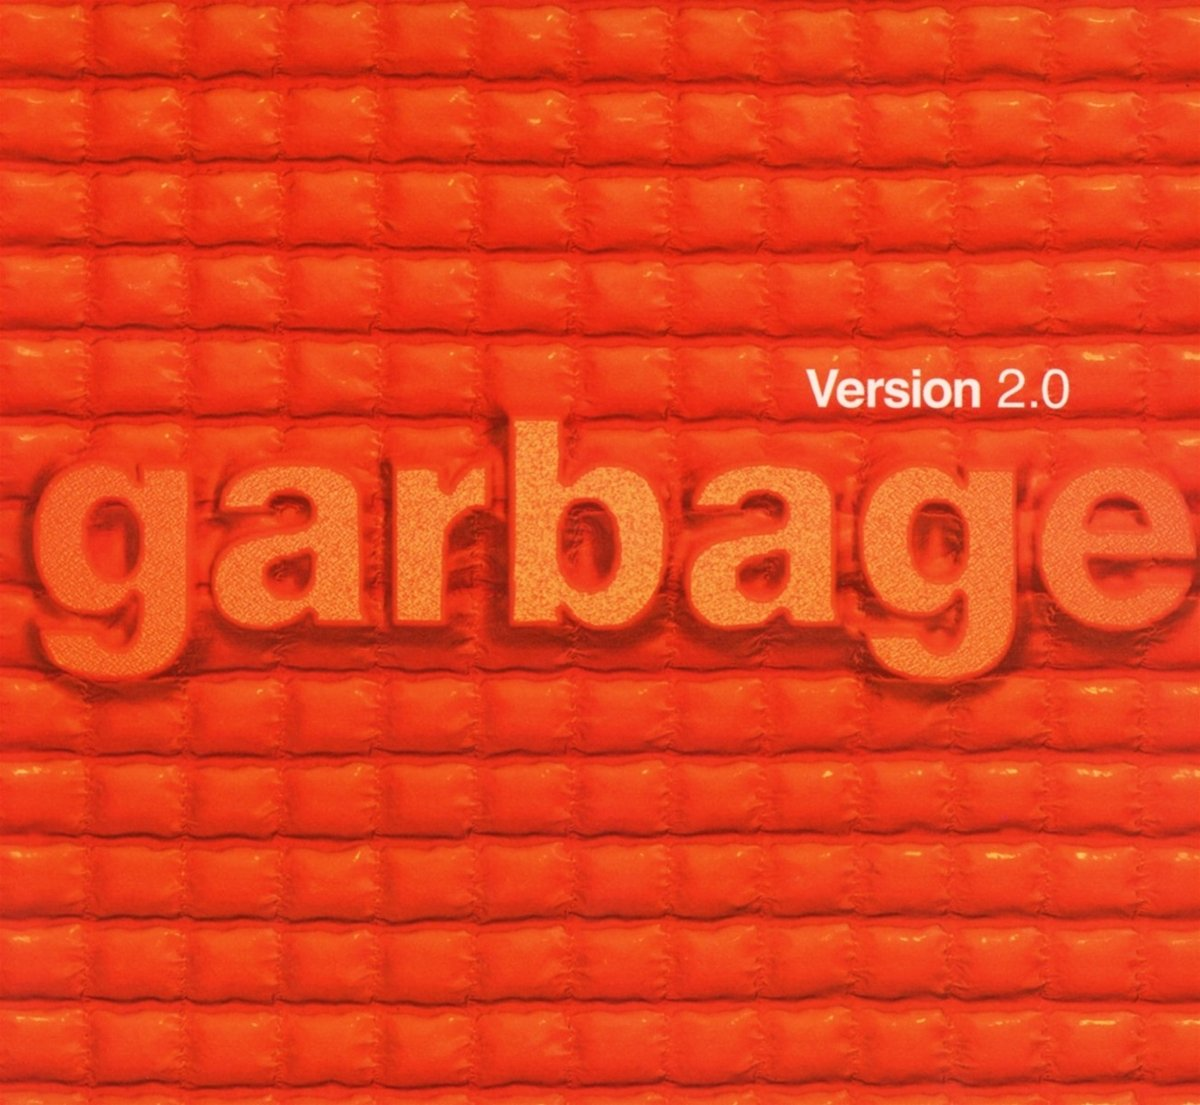 GARBAGE - Version 2.0: 20th Anniversary Edition - Amazon.com Music